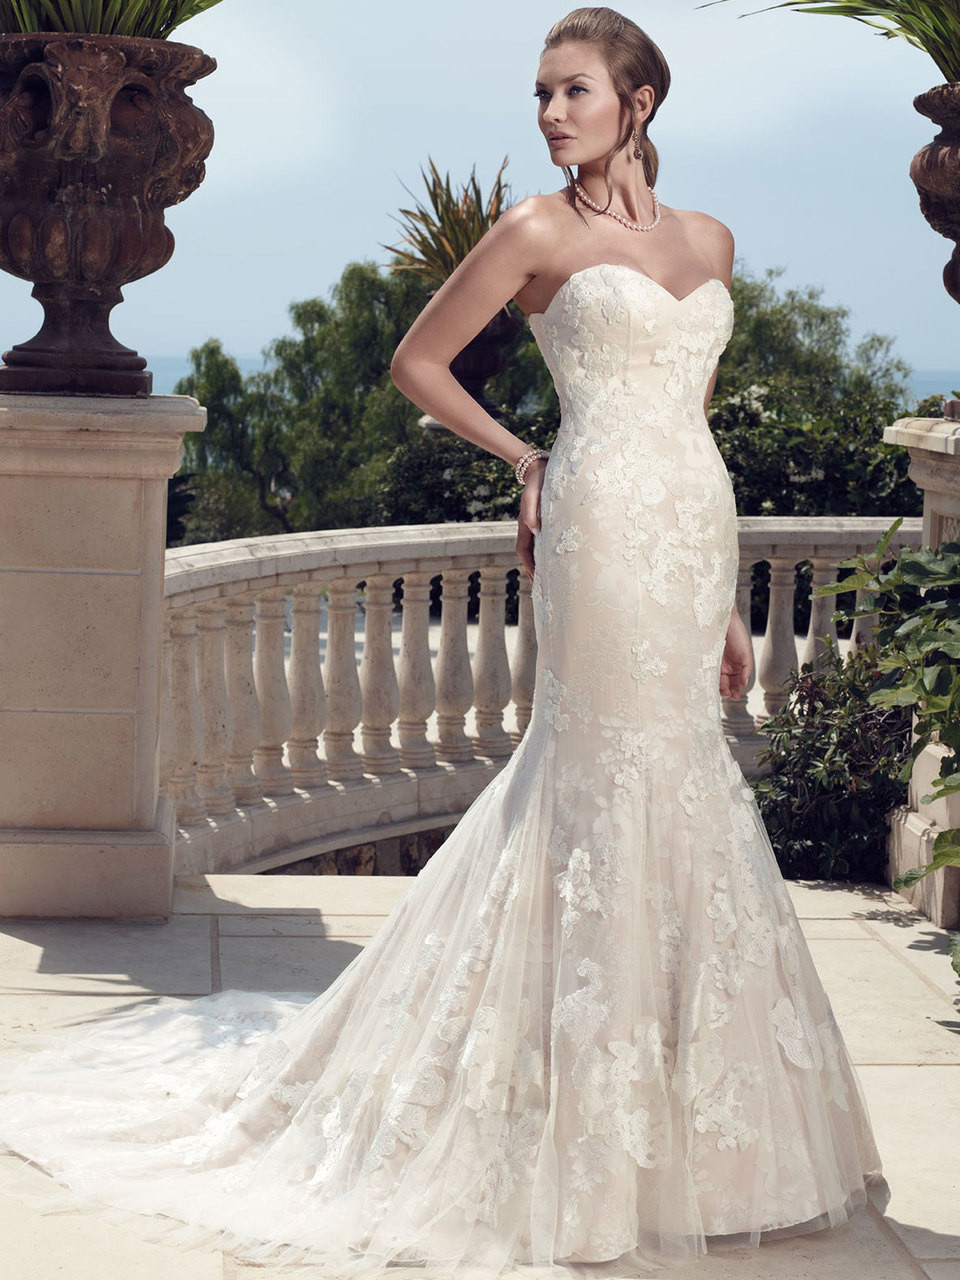 Casablanca 2142 Strapless Mermaid Bridal Gown Dimitradesigns Com